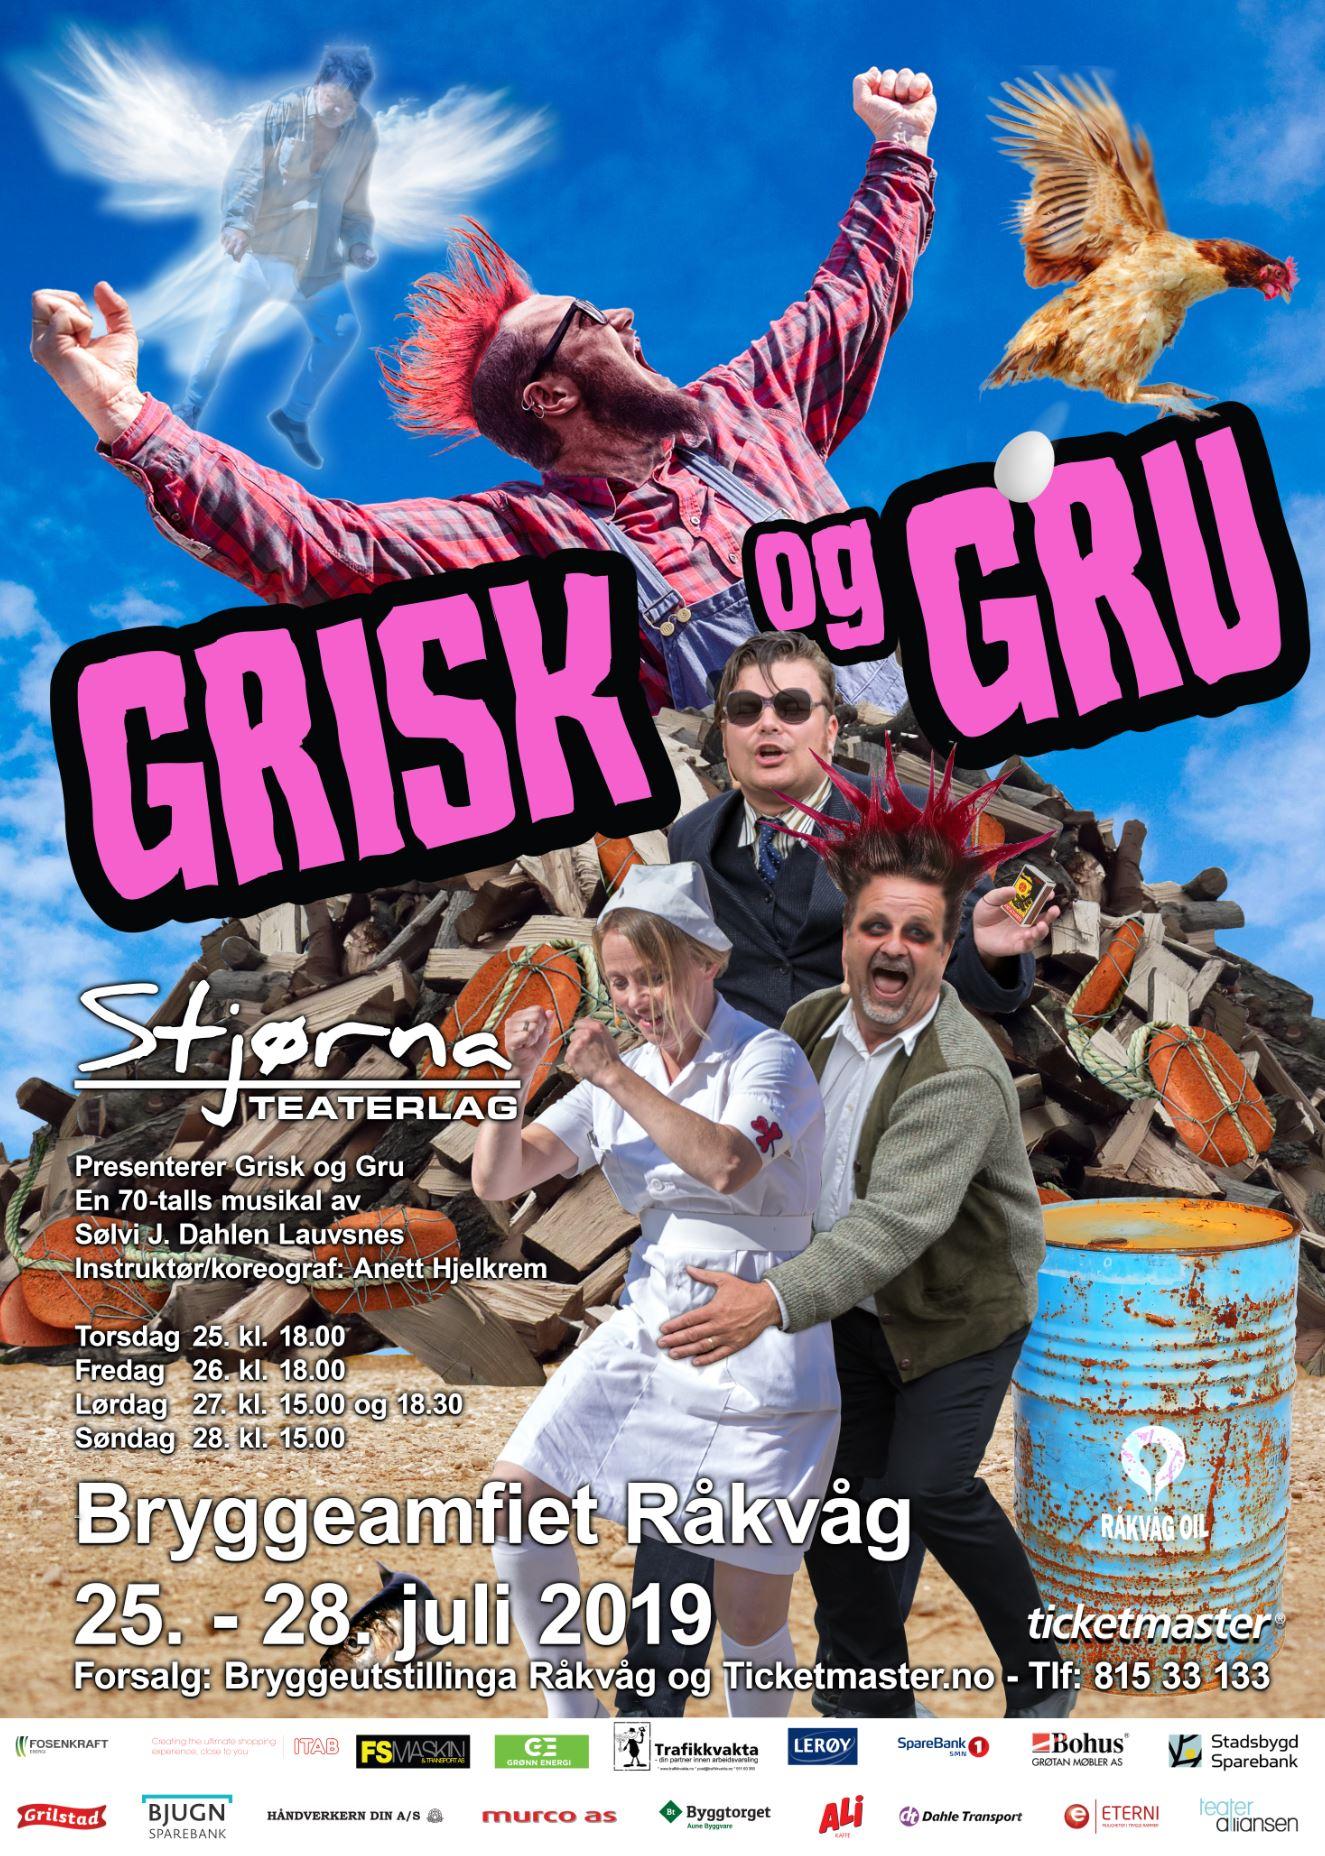 Stjørna Teaterlag - plakat 2019